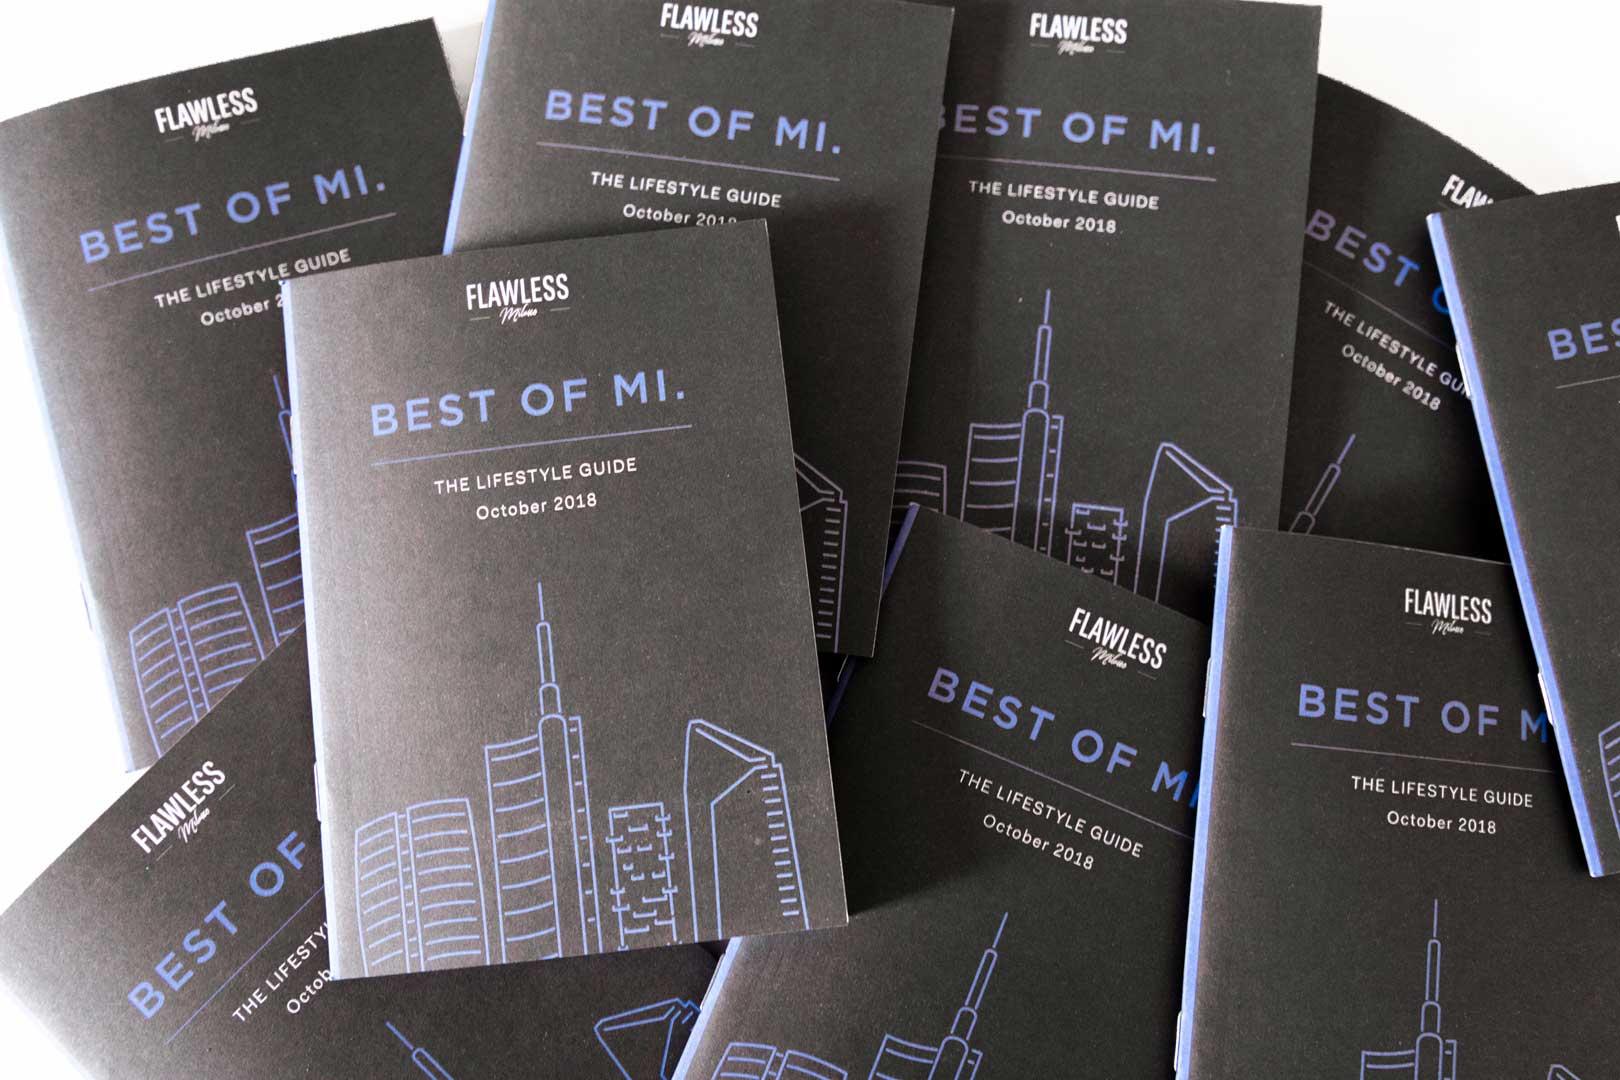 Best of Mi. Ottobre 2018 - Milano